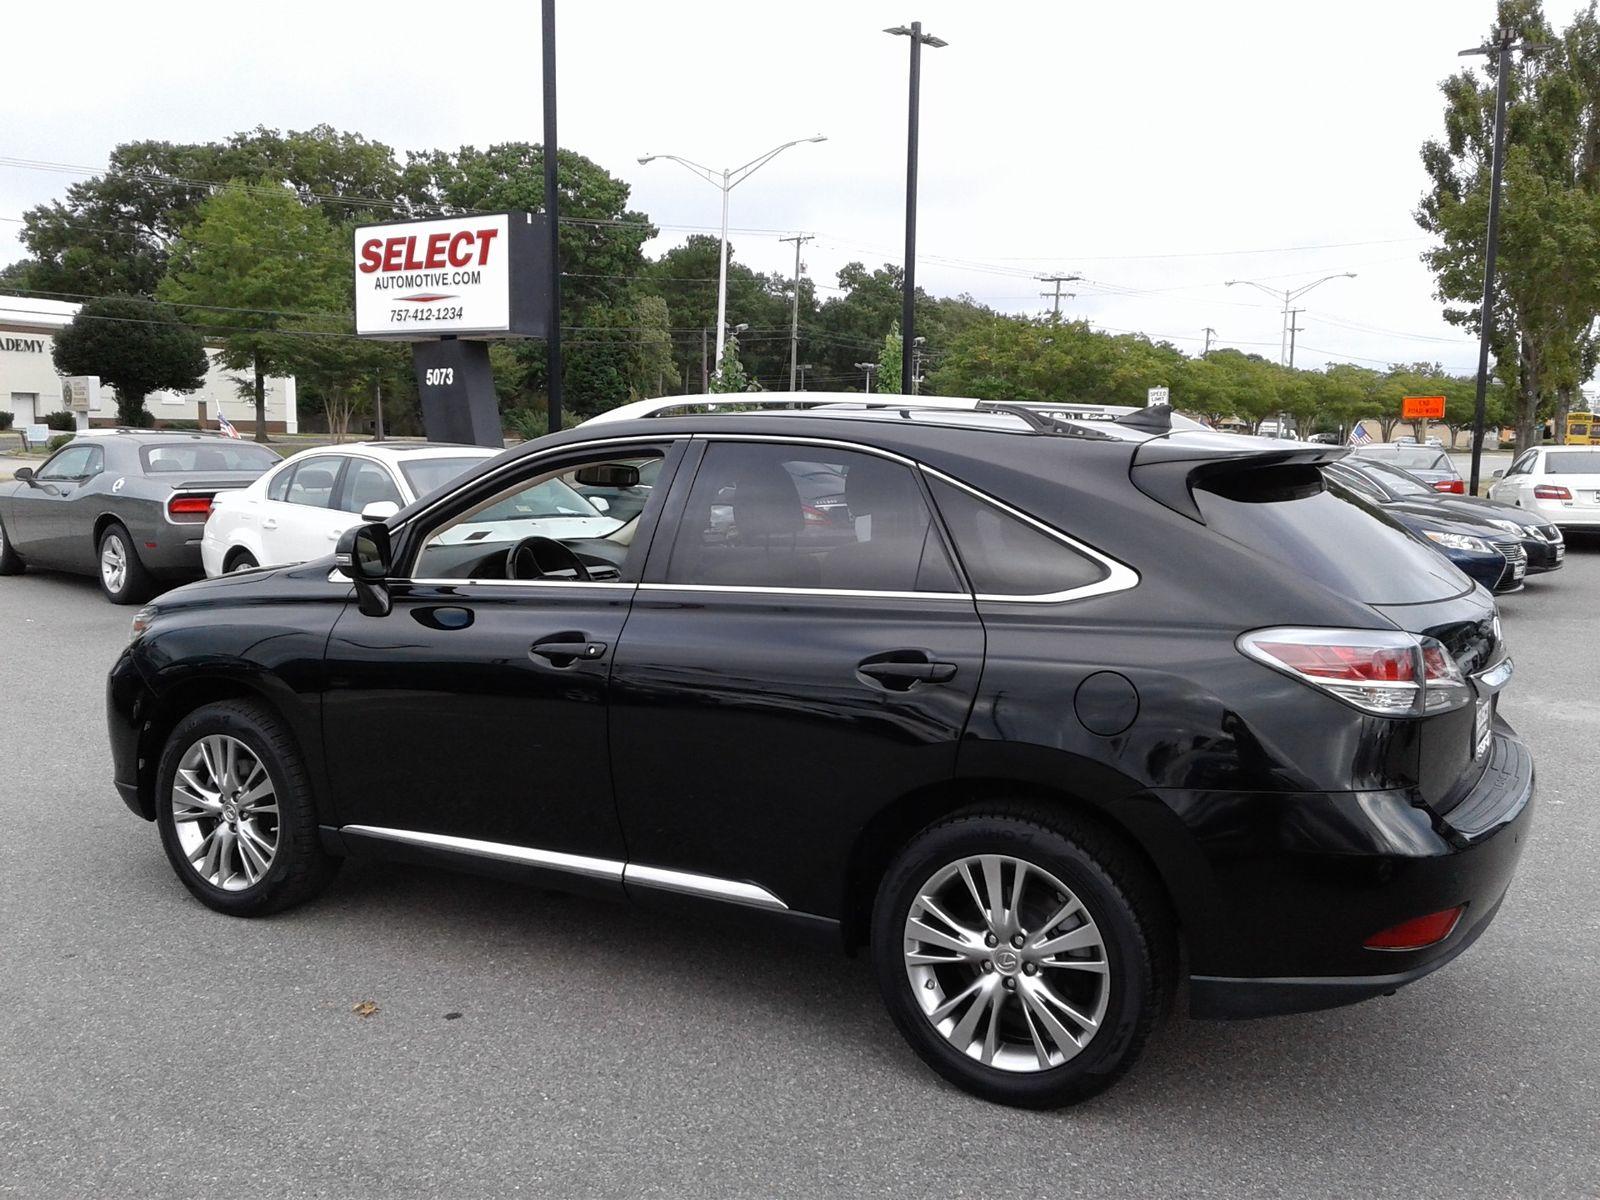 2014 Lexus RX 350 city Virginia Select Automotive VA